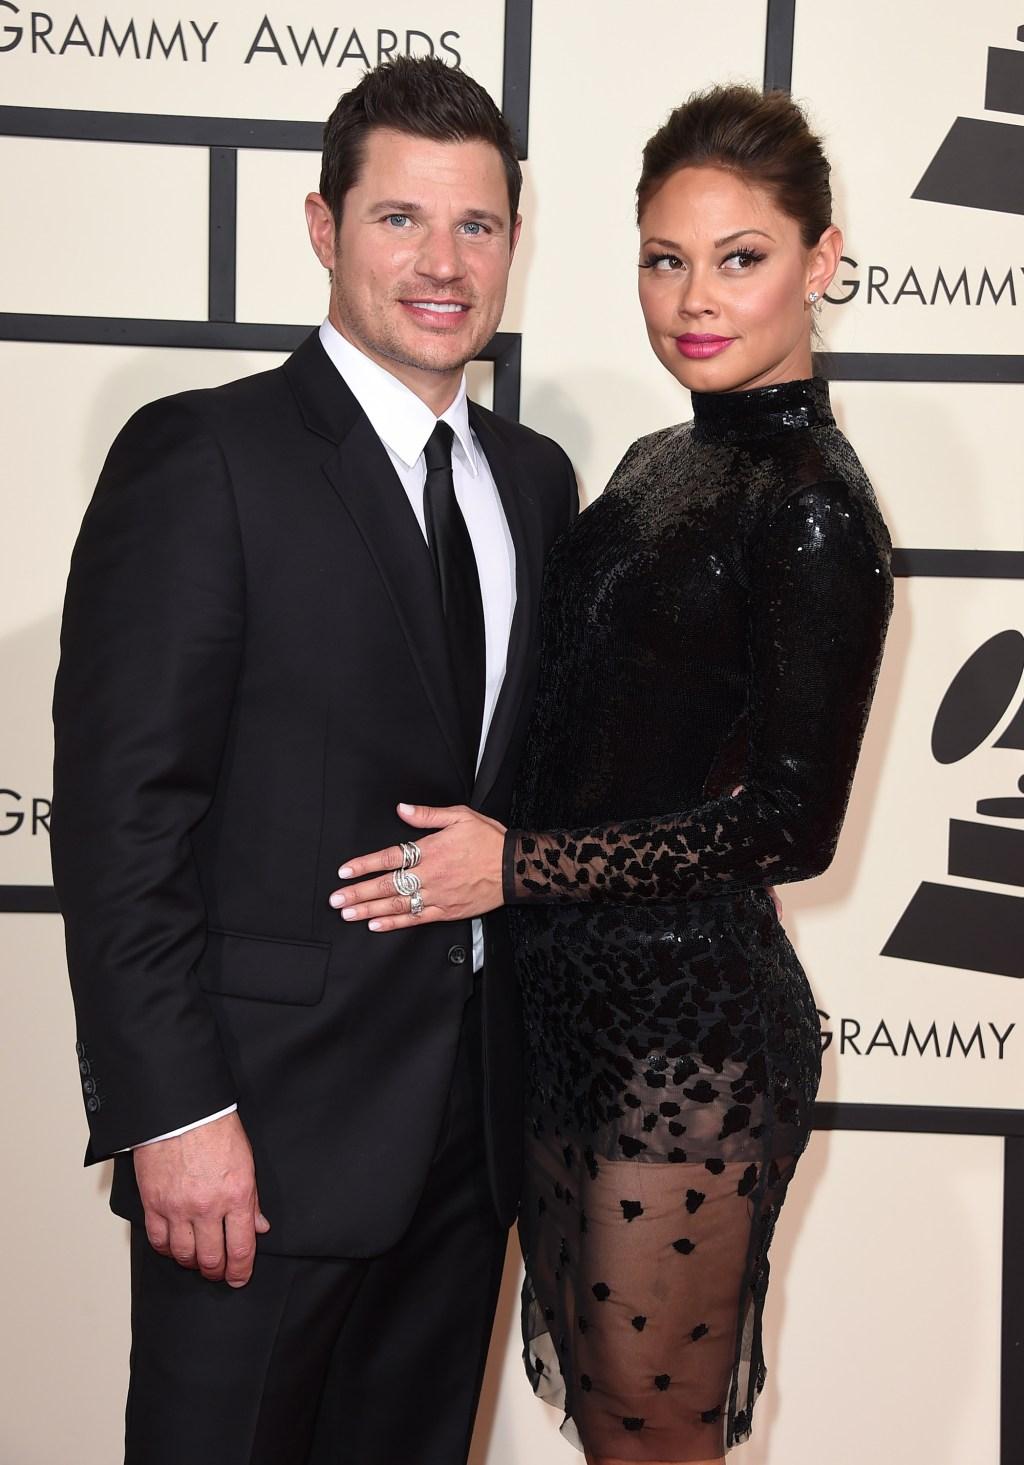 Nick Lachey, Vanessa Lachey, Grammys